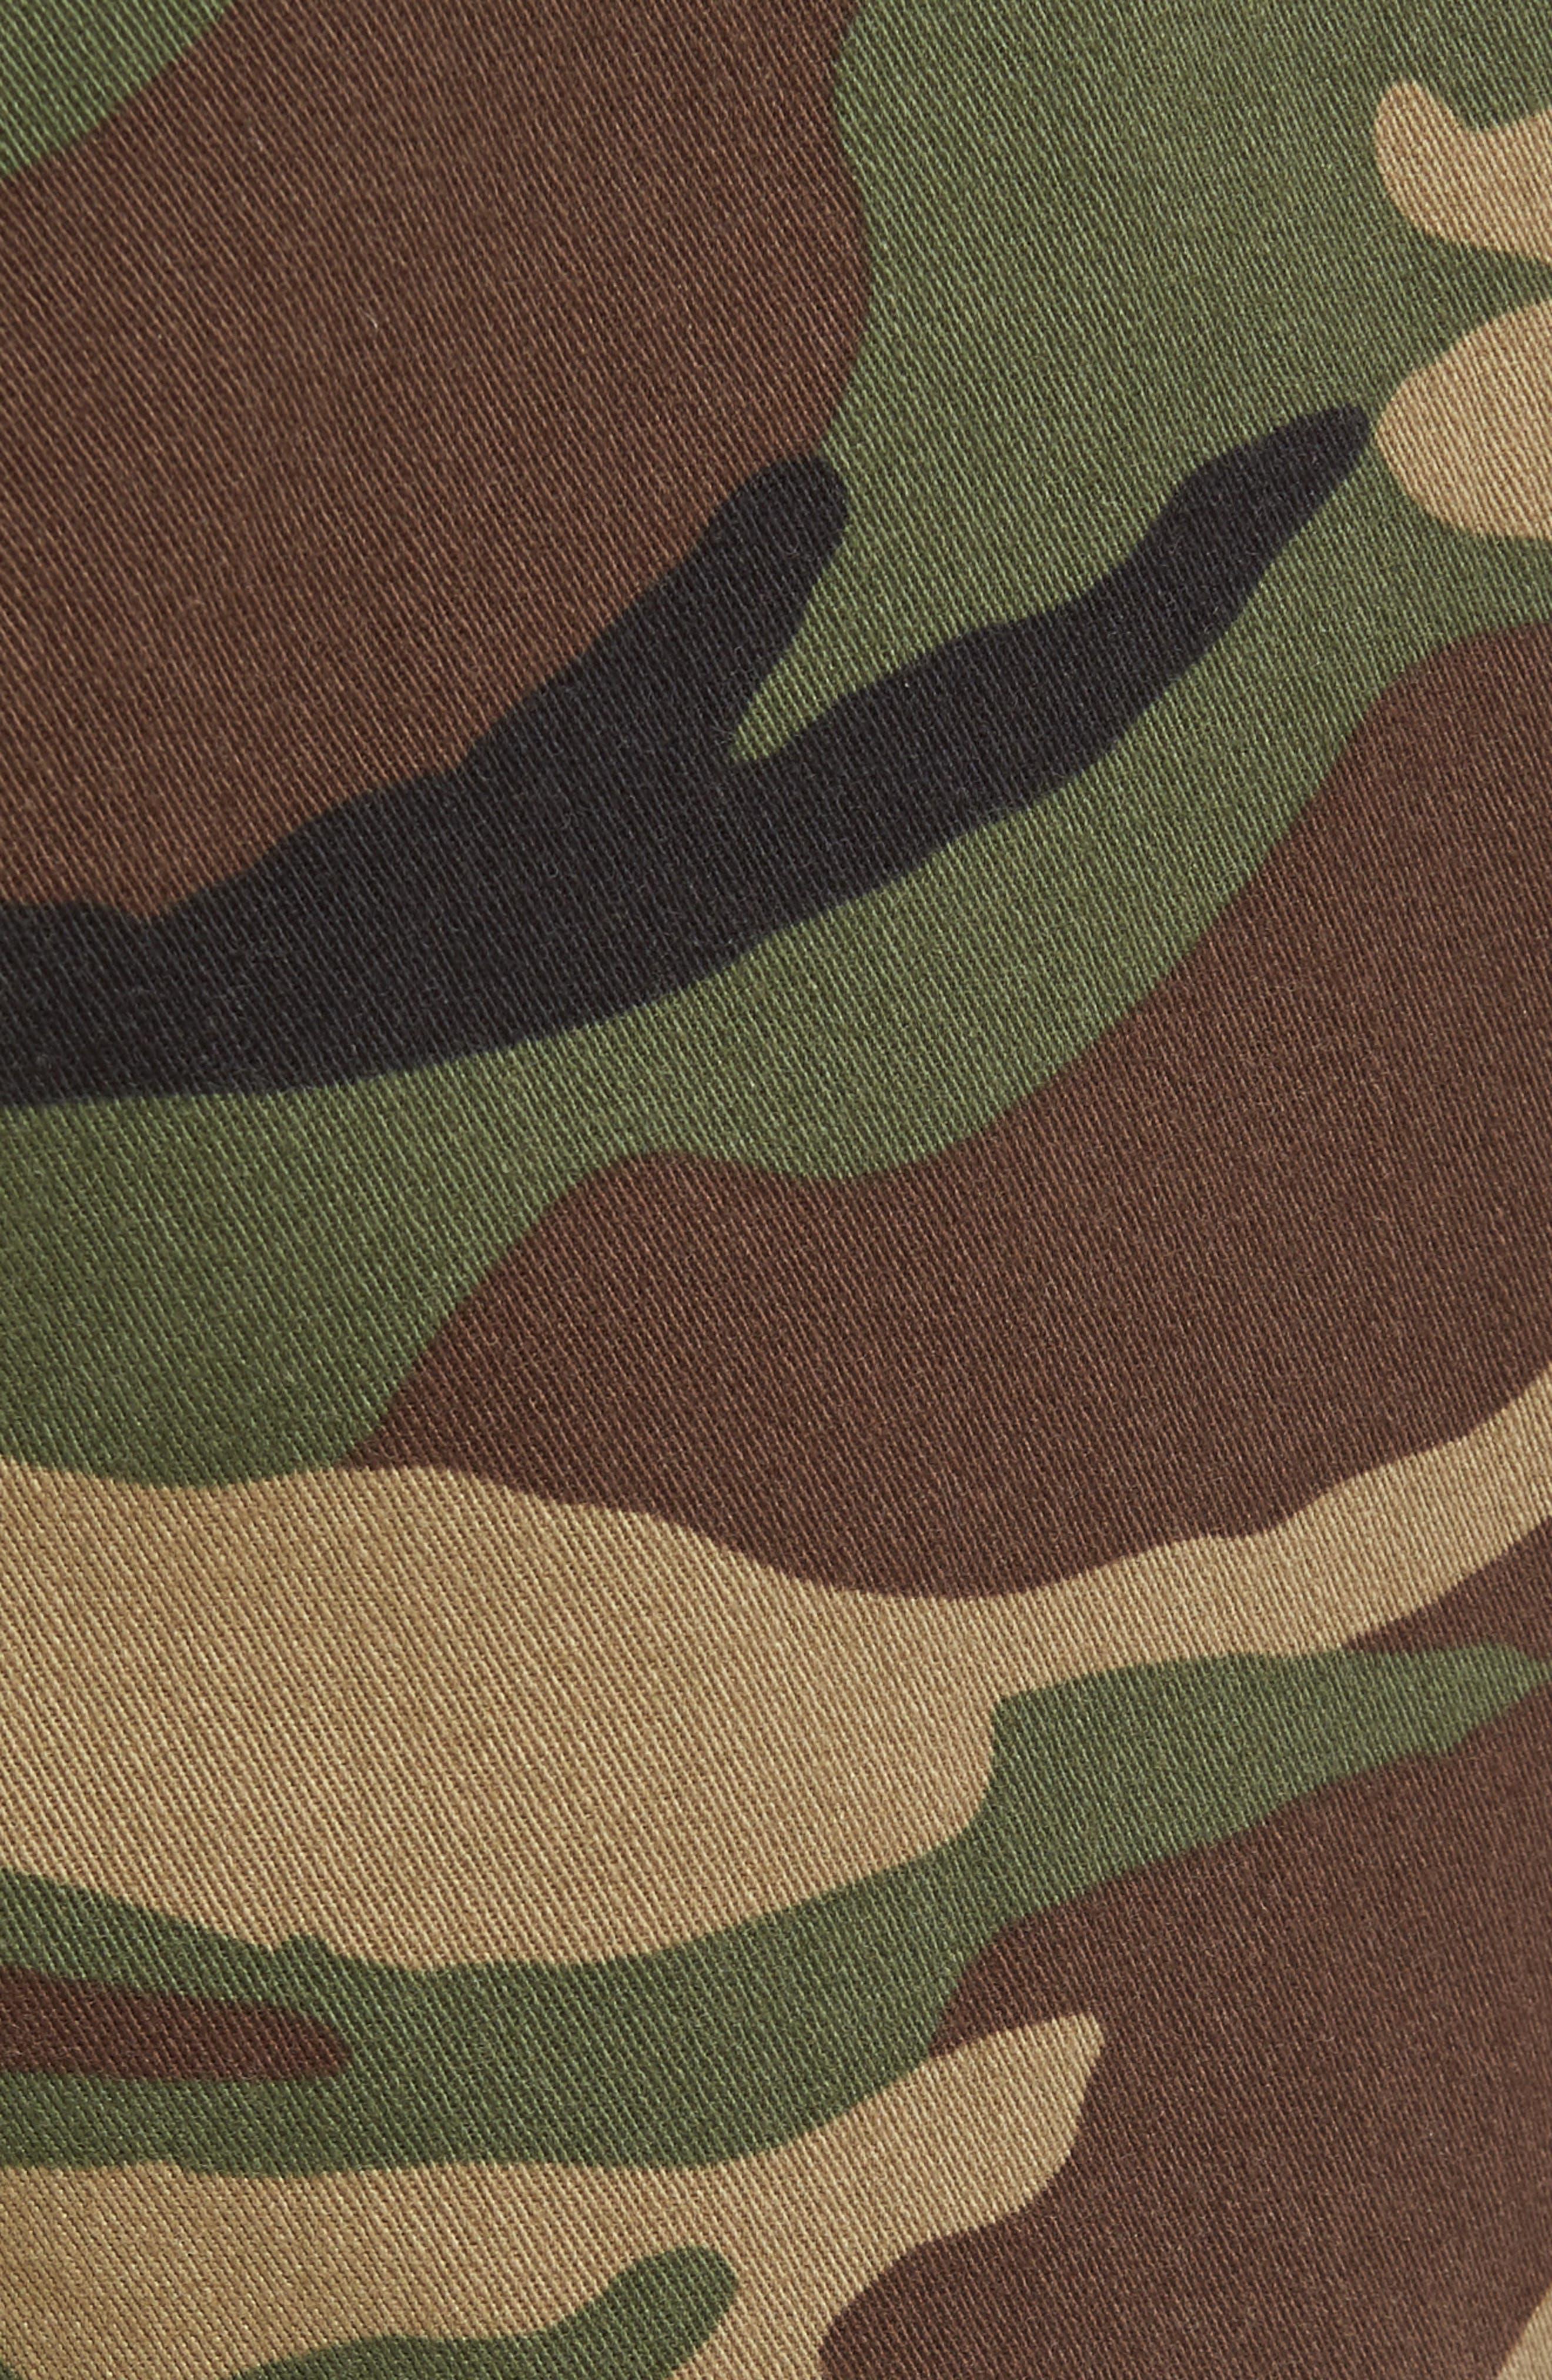 Slim Fit Cargo Shorts,                             Alternate thumbnail 5, color,                             300